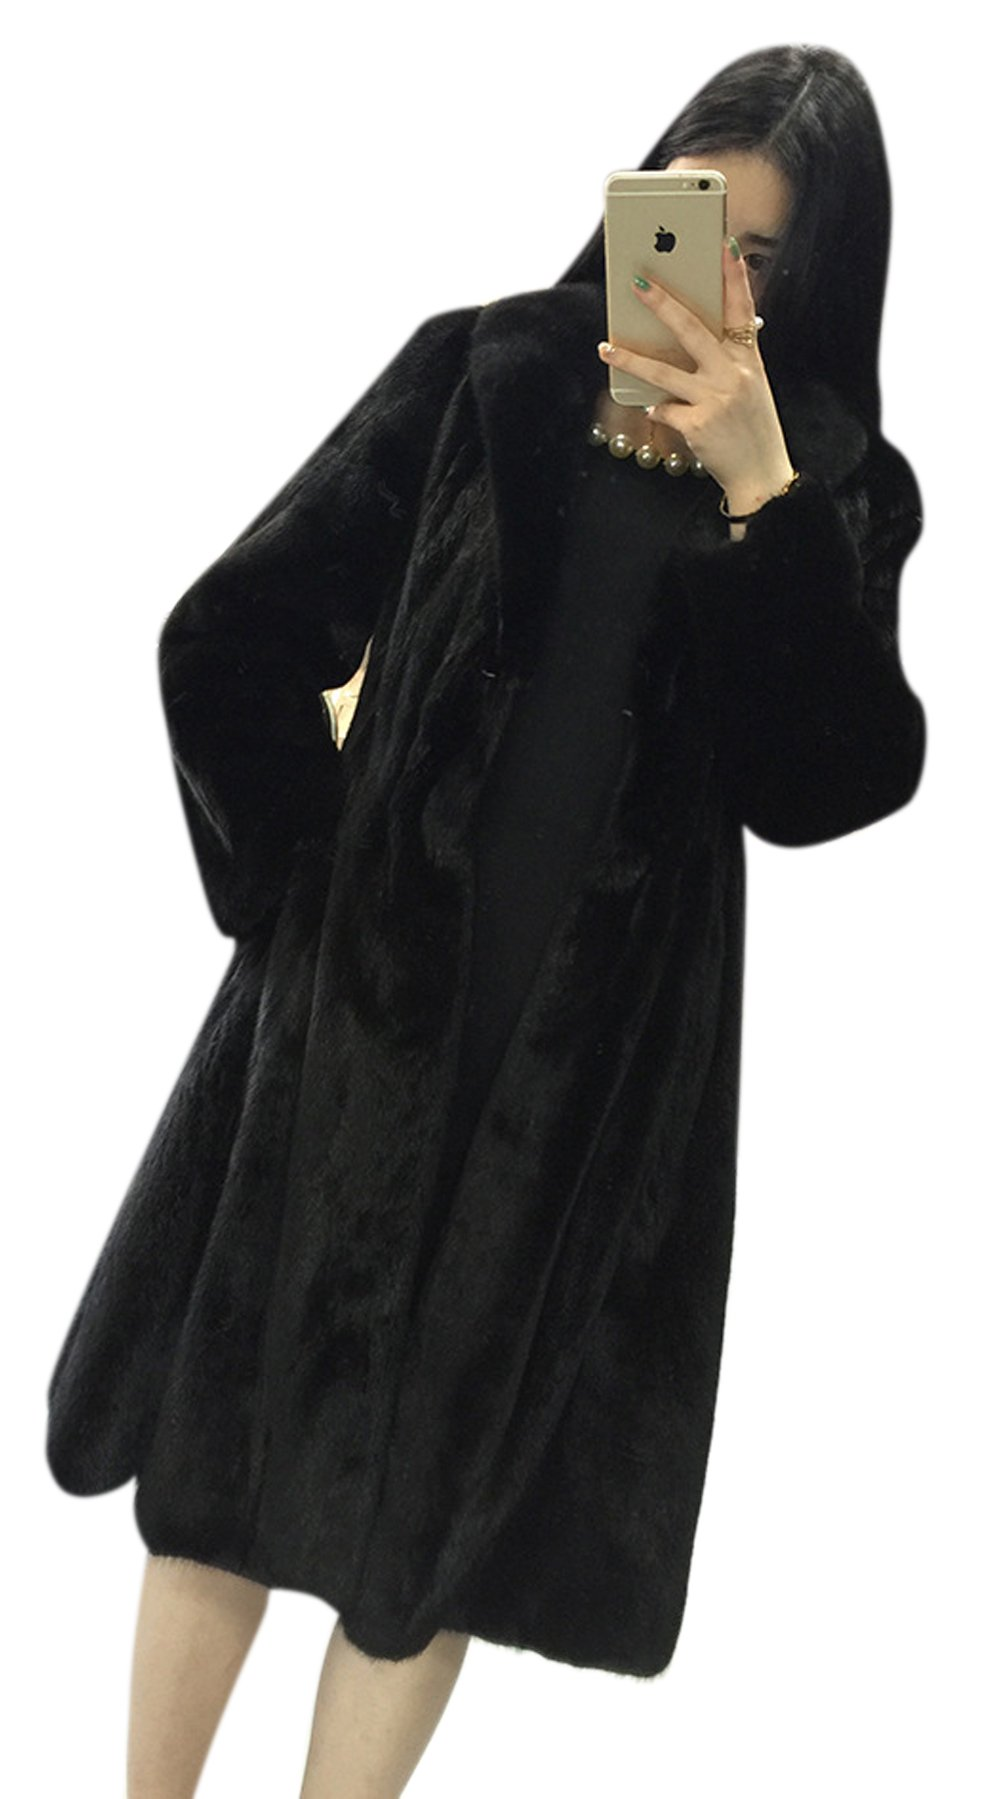 AZIZY Women's Black Luxury Faux Mink Fur Slim Lapel Long Sleeve Thick Warm Maxi Coat 2XL by AZIZY (Image #3)